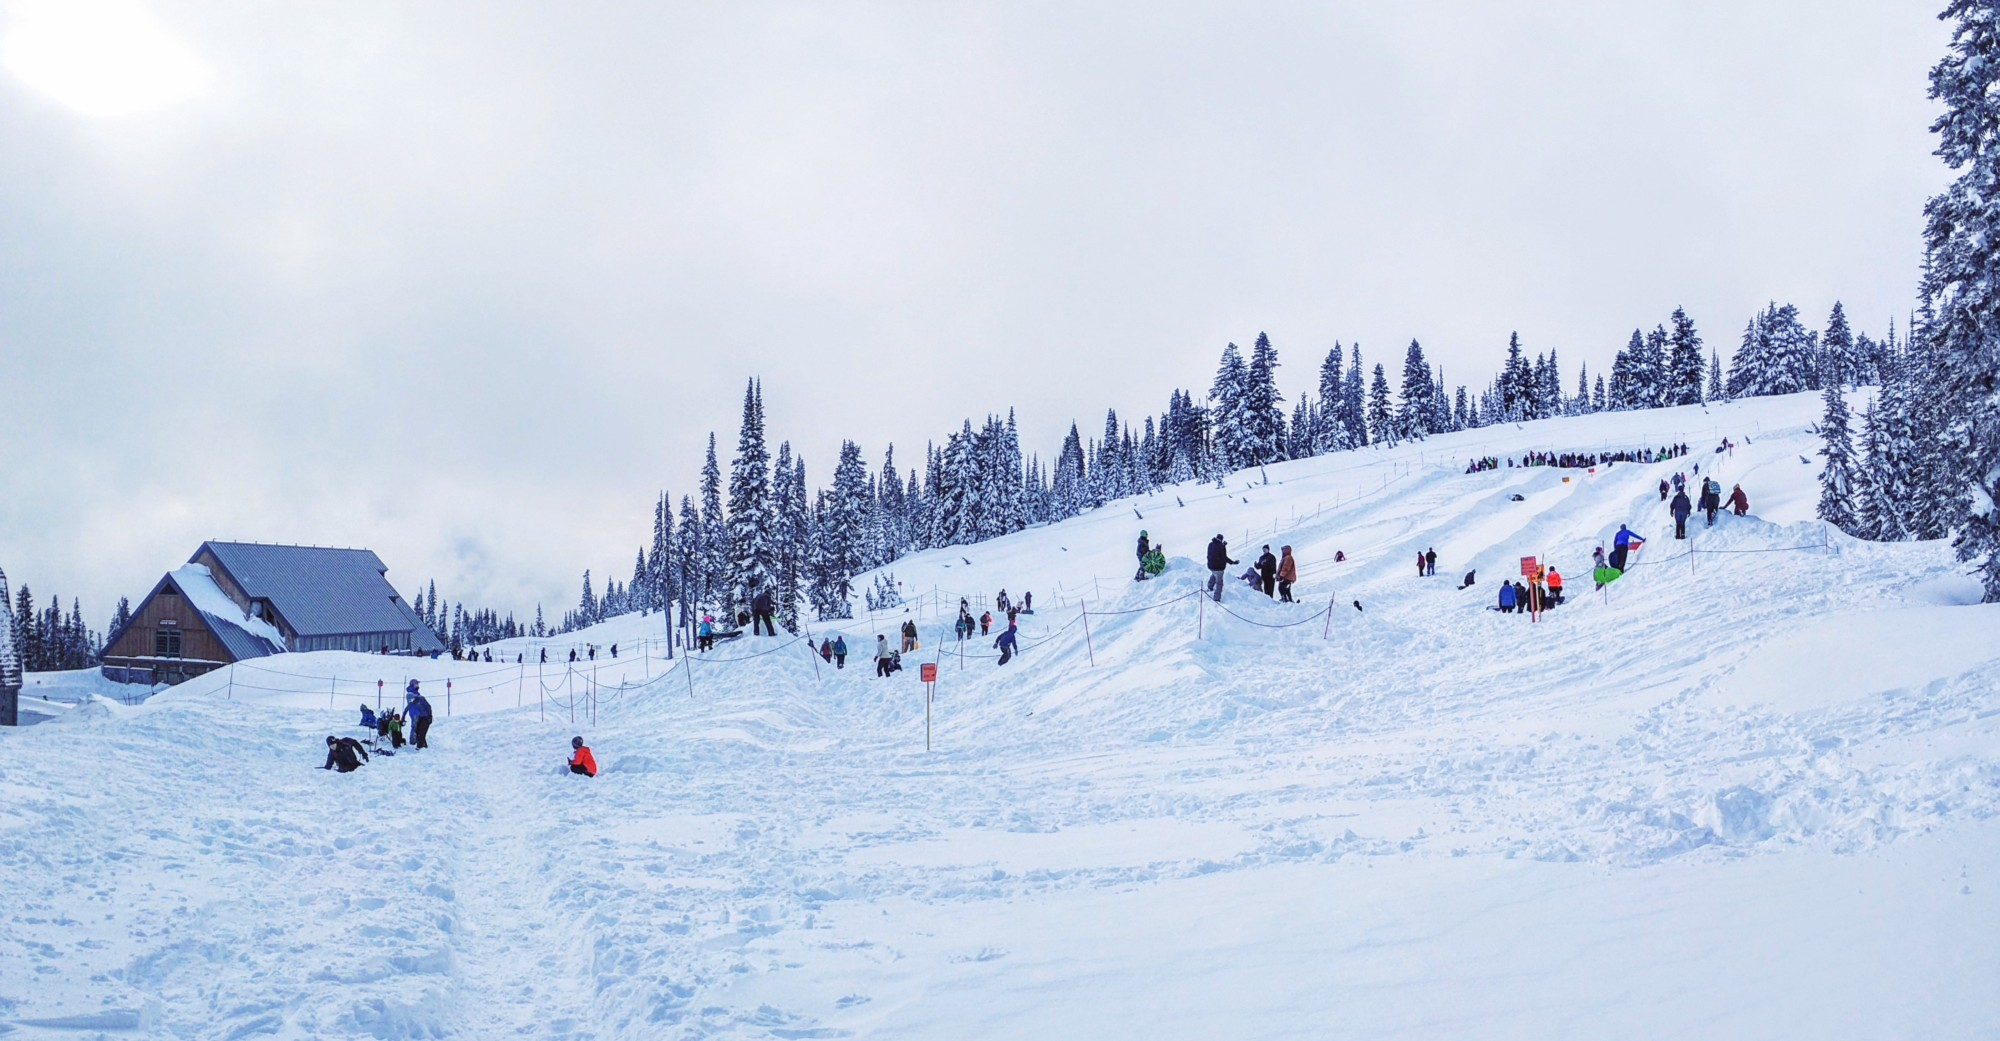 Sledding/Snowplay area